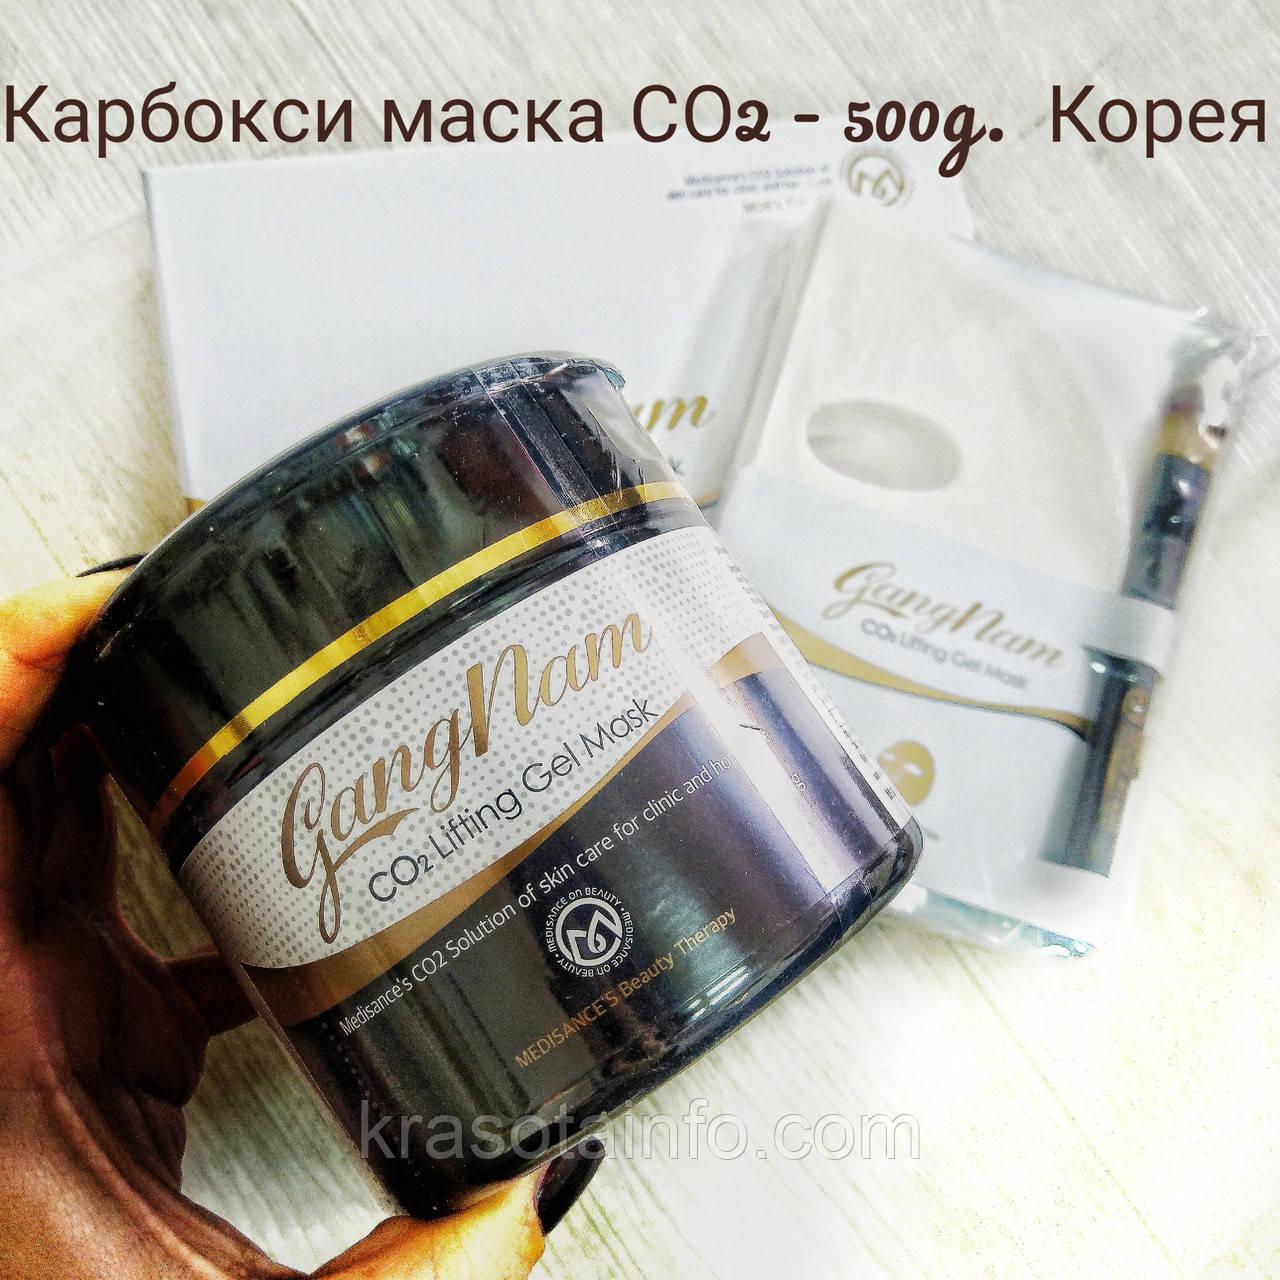 СО2 маска карбокситерапия Улучшенная формула CO2 CARBOXY Mask 500г Gangnam Корея